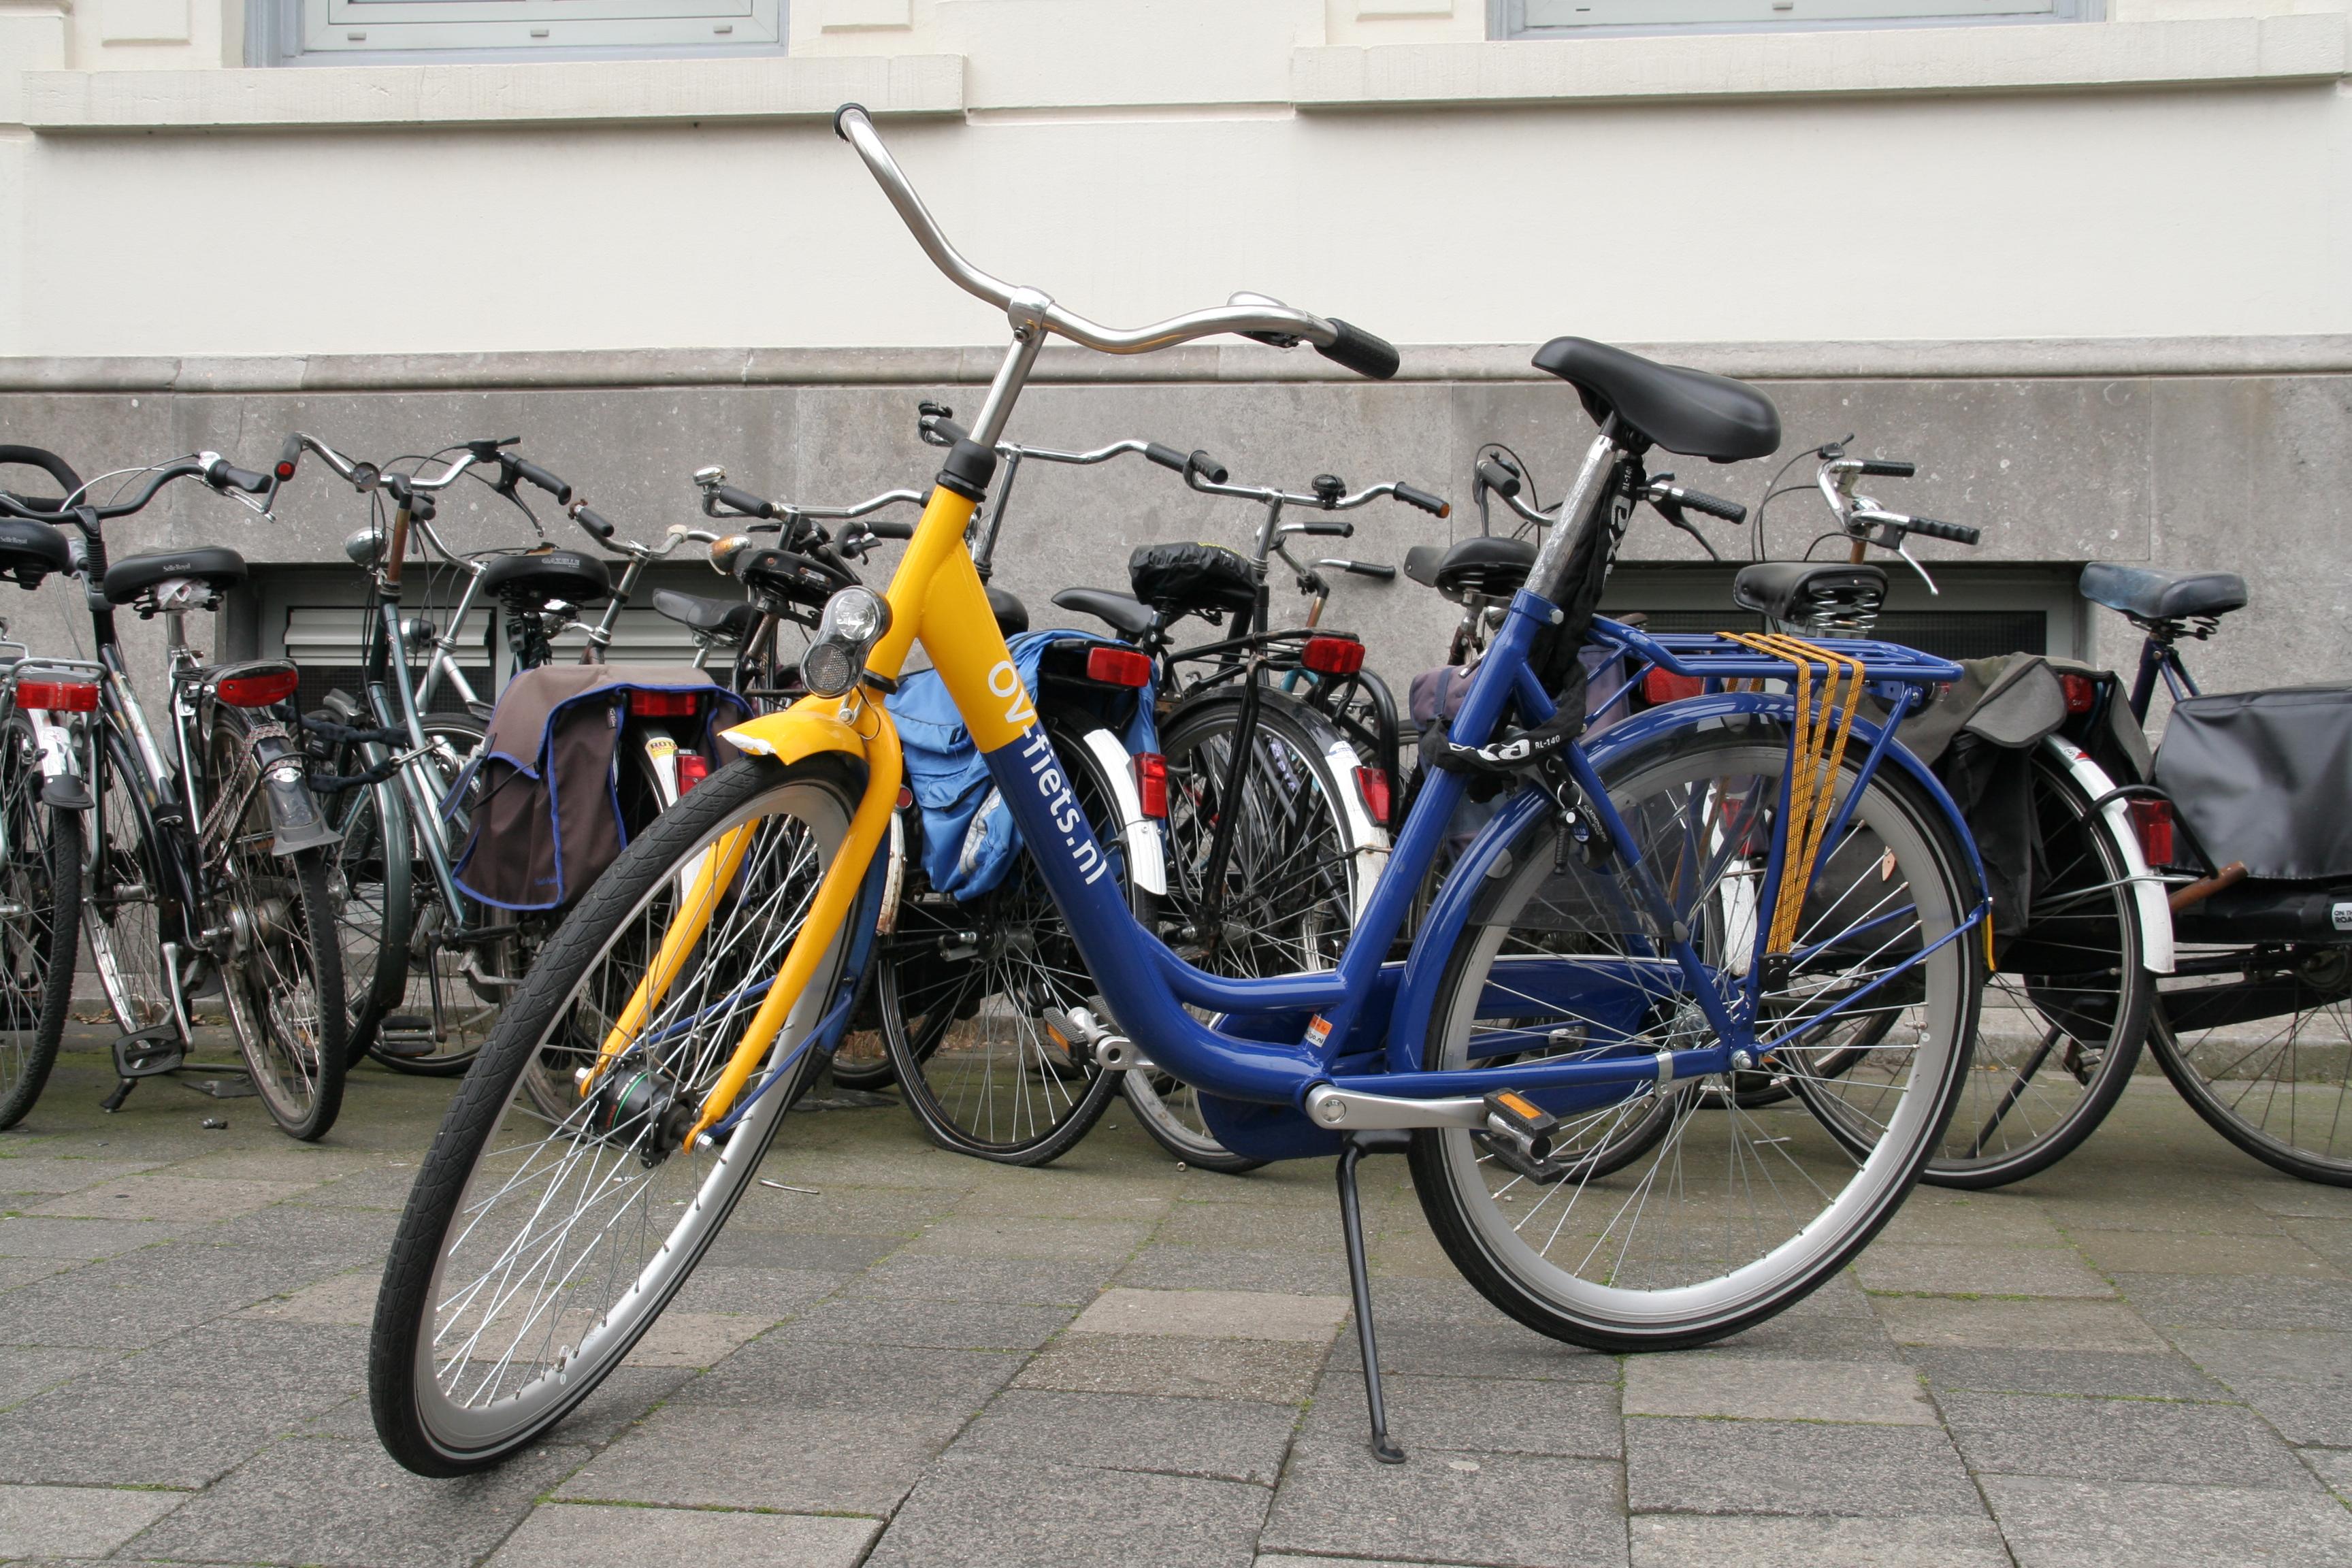 An OV-fiets bike share bike.